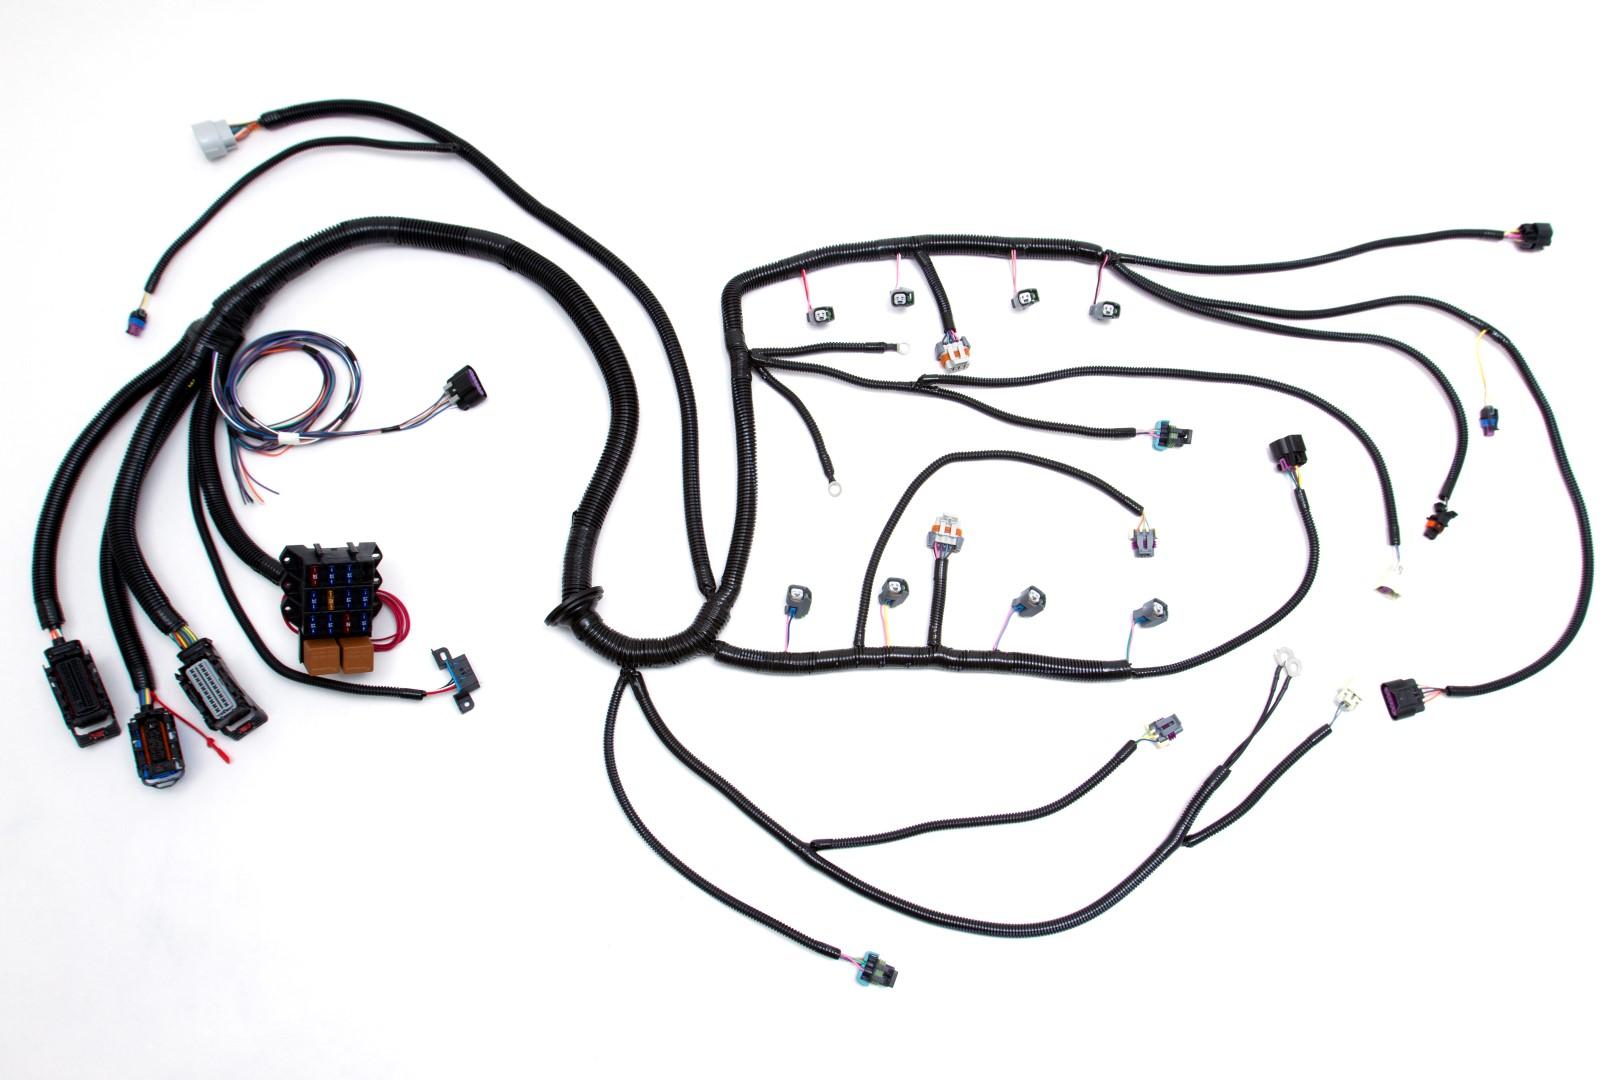 c3 corvette ls wiring harness